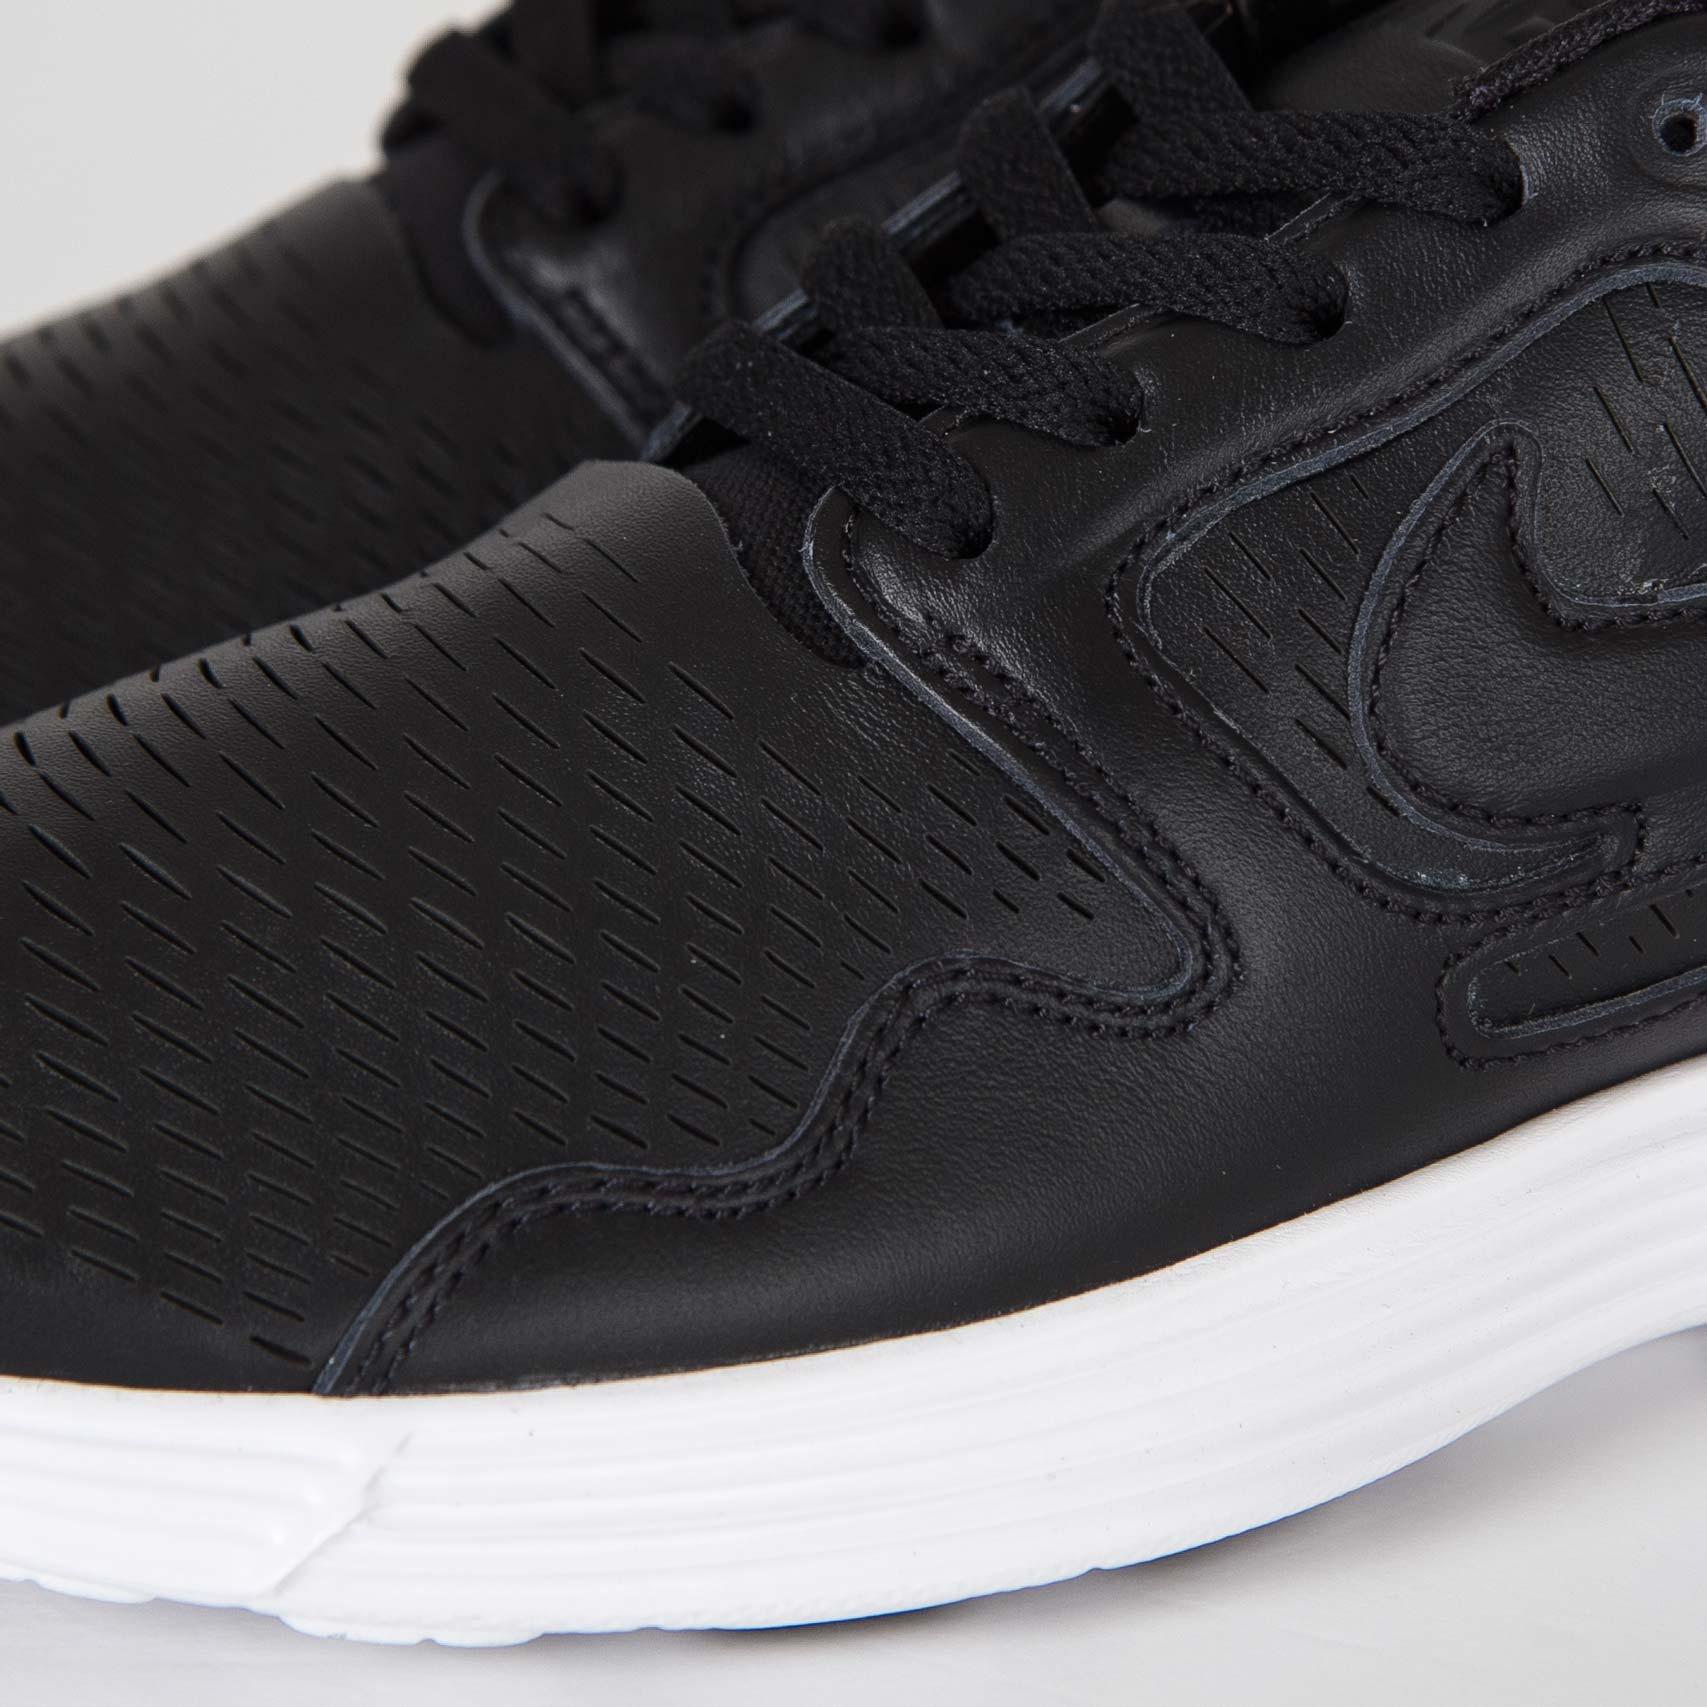 Nike Lunar Flow LSR Premium - 833127